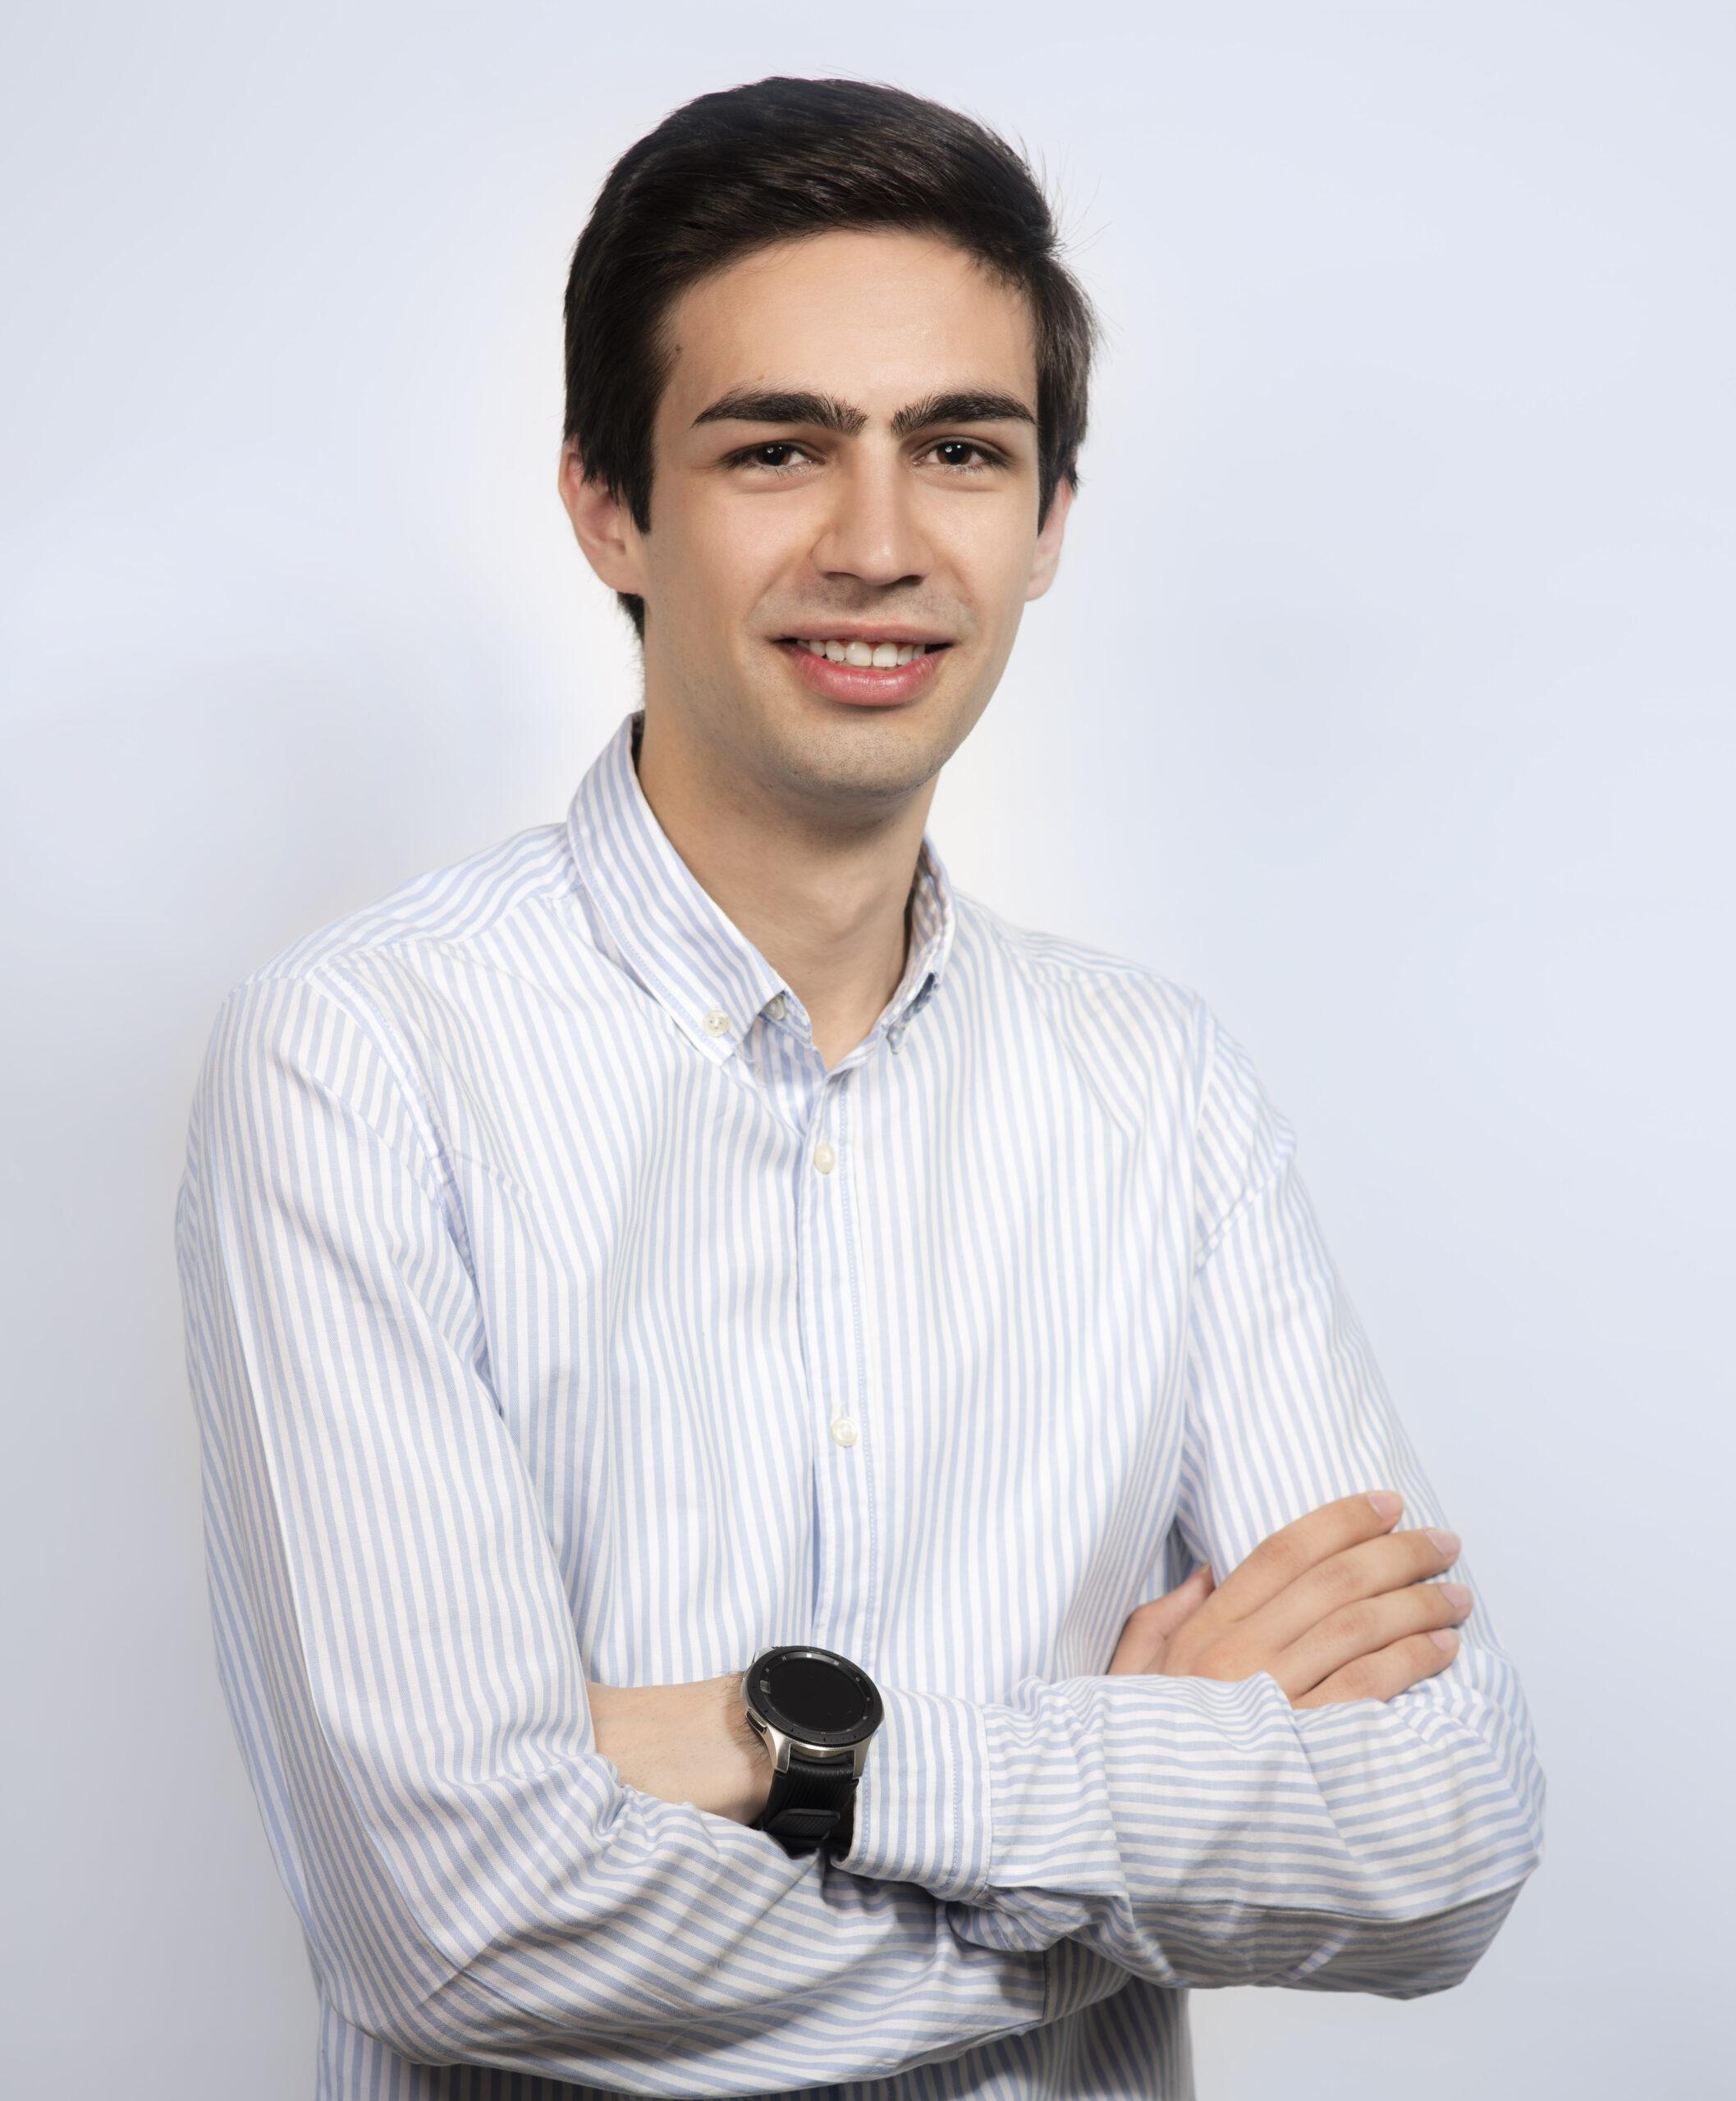 Joud Khattab